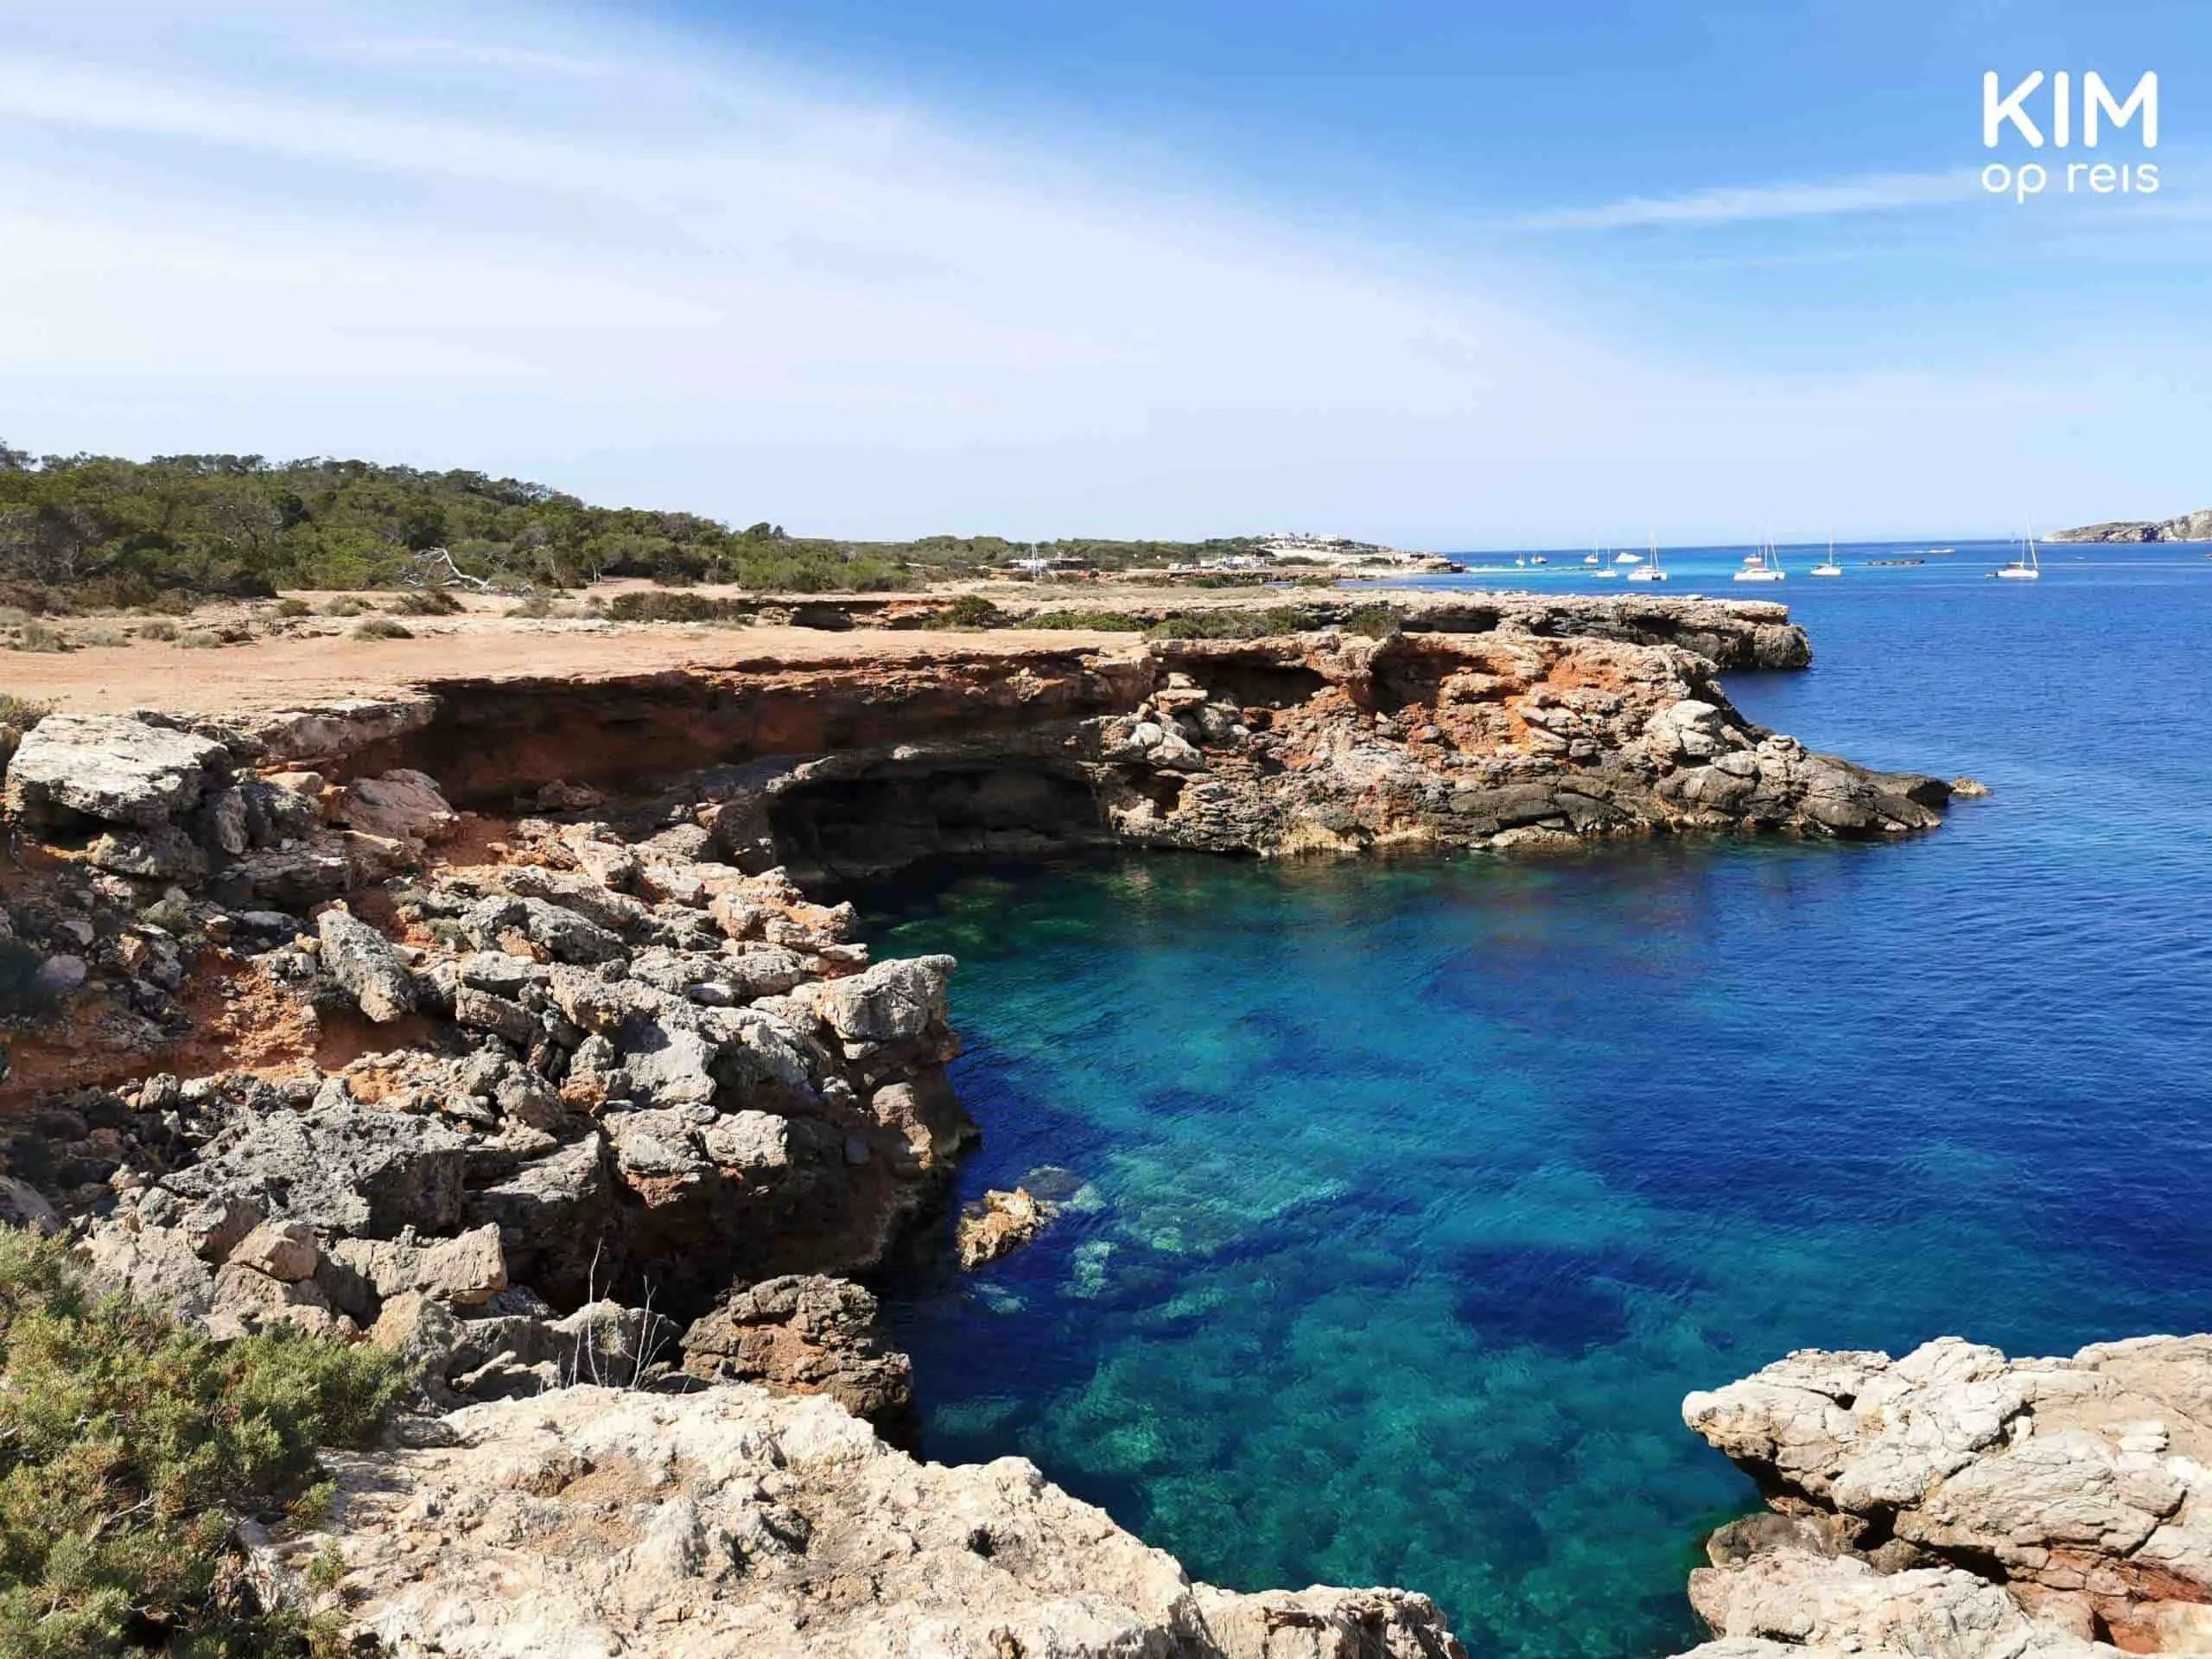 Torre d'en Rovira Ibiza rocks: clear blue bay against the rocks